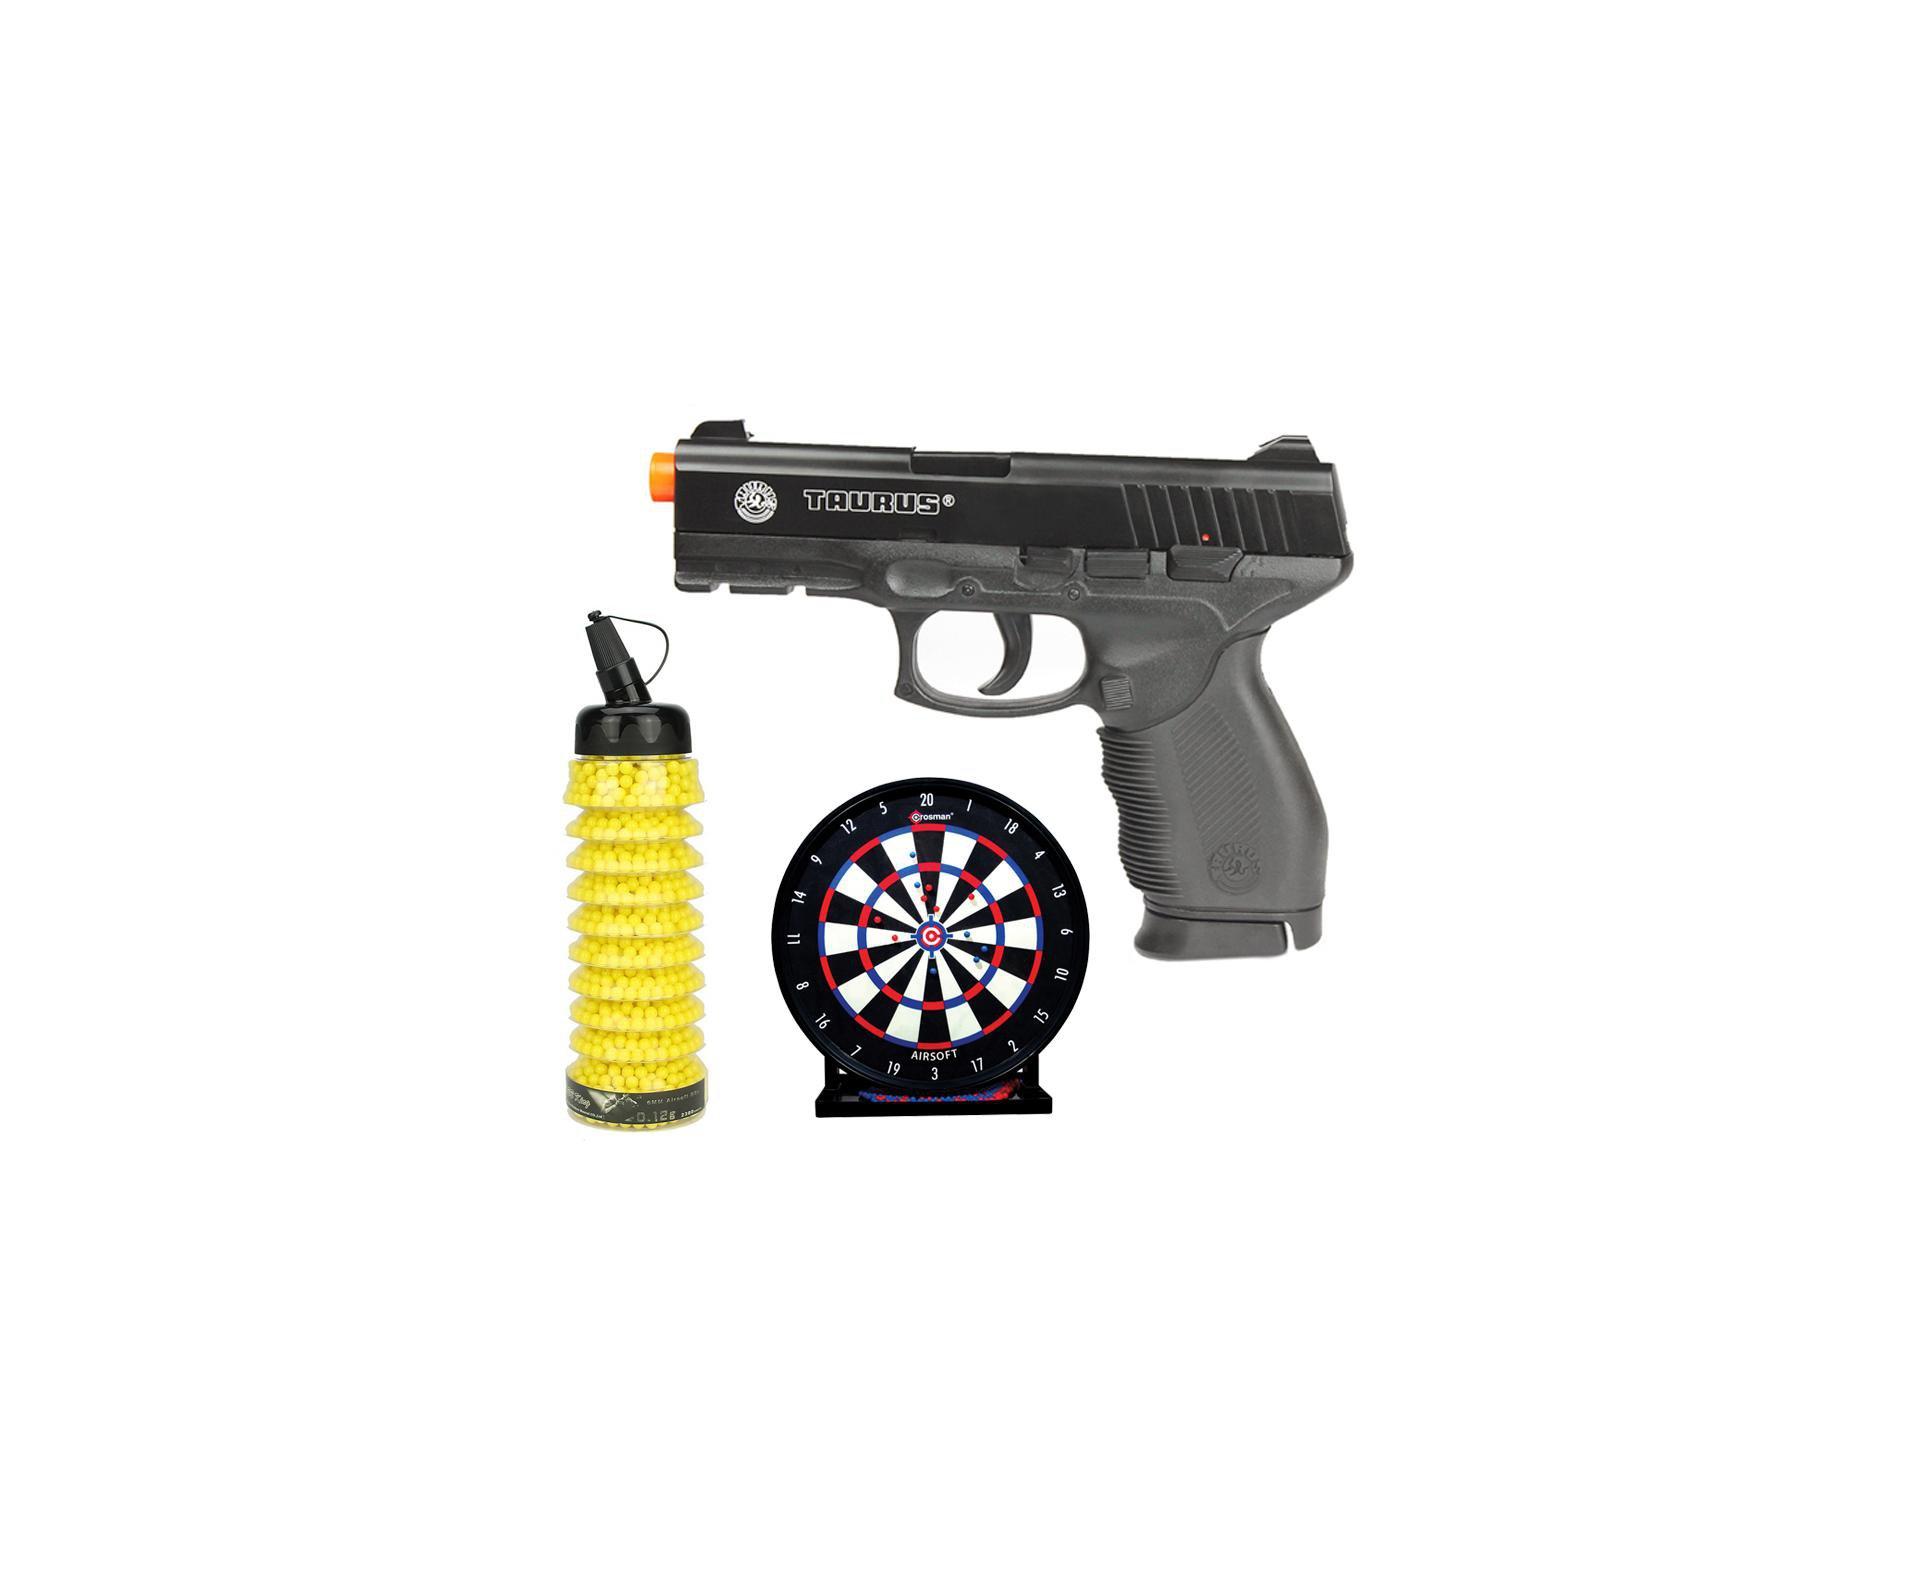 Pistola De Airsoft Taurus Pt 24/7 Semi/metal Cal 6,0 + Alvo Colante + 2300 Bbs 0,12g - Cyber Gun